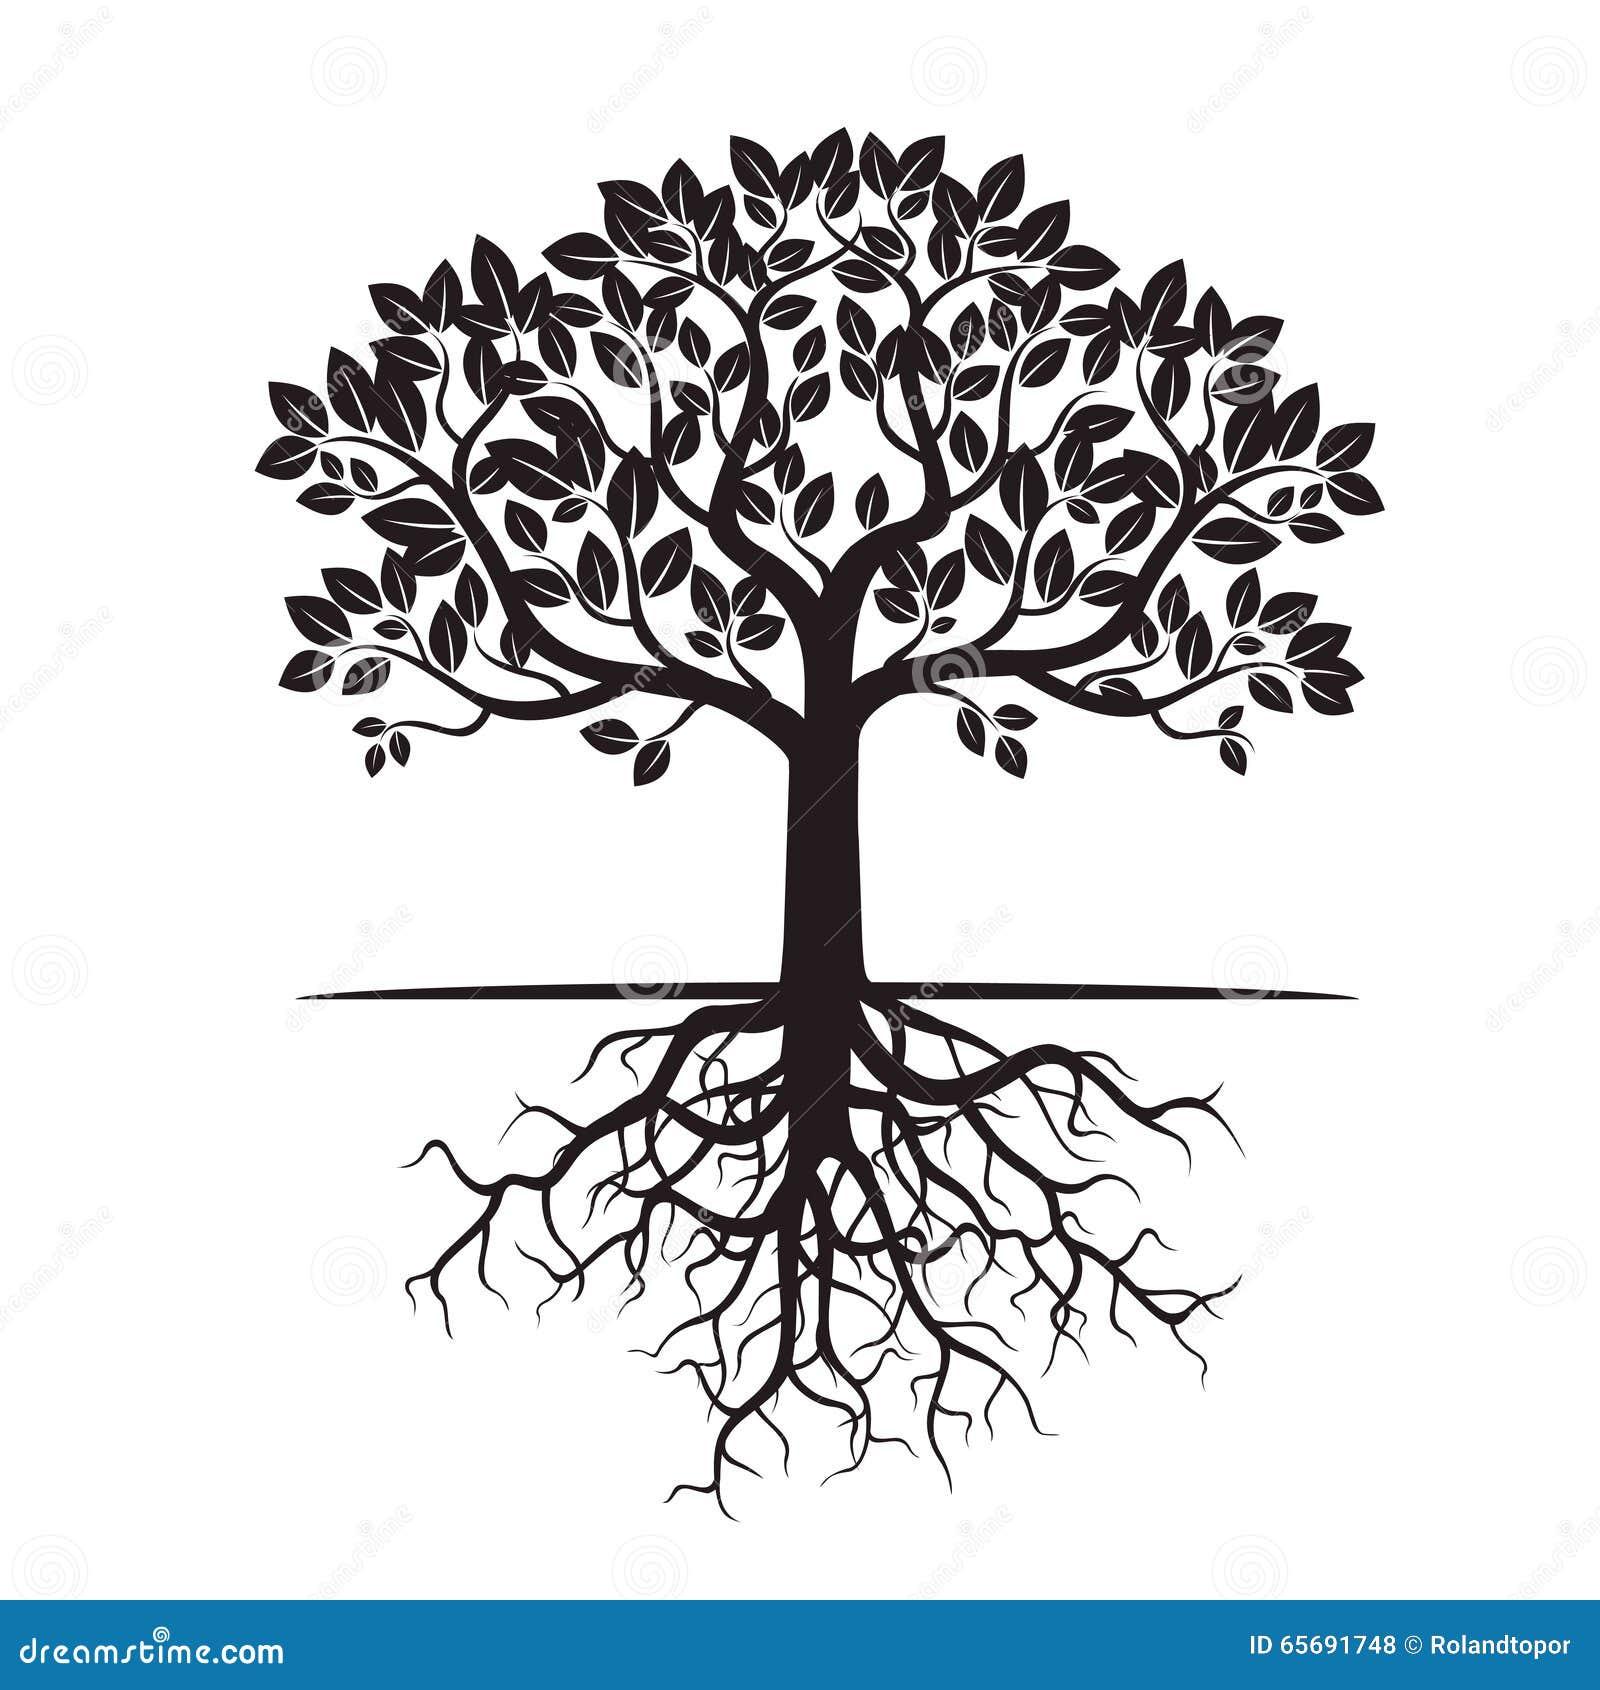 Graphic Design Oak Tree